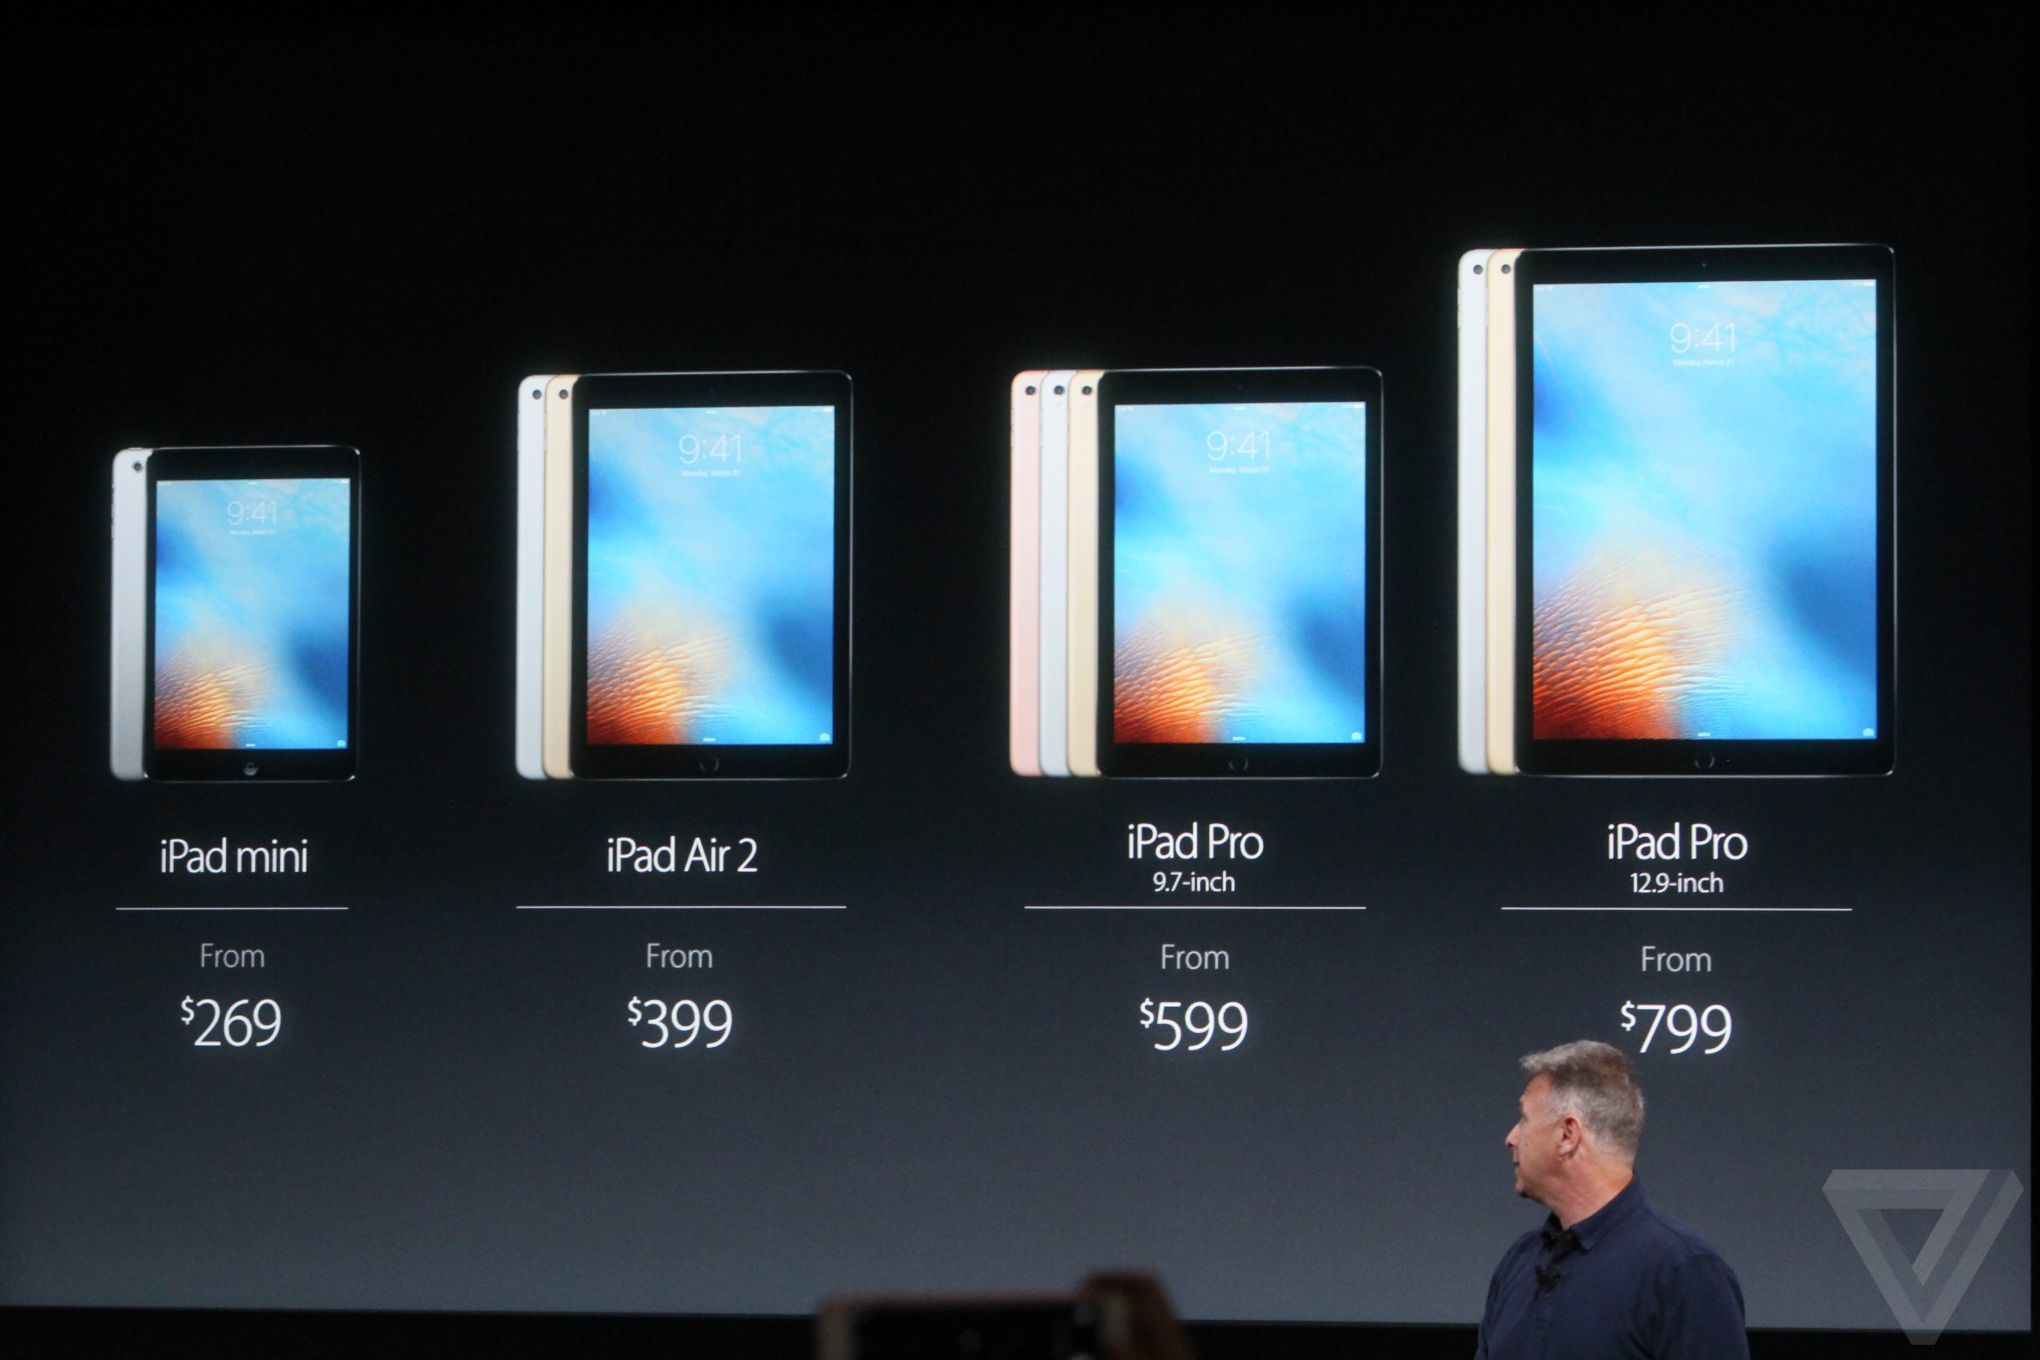 Details Of The Apple Ipad Series Specs And Pricing Ipad Ipad Pro Ipad Air